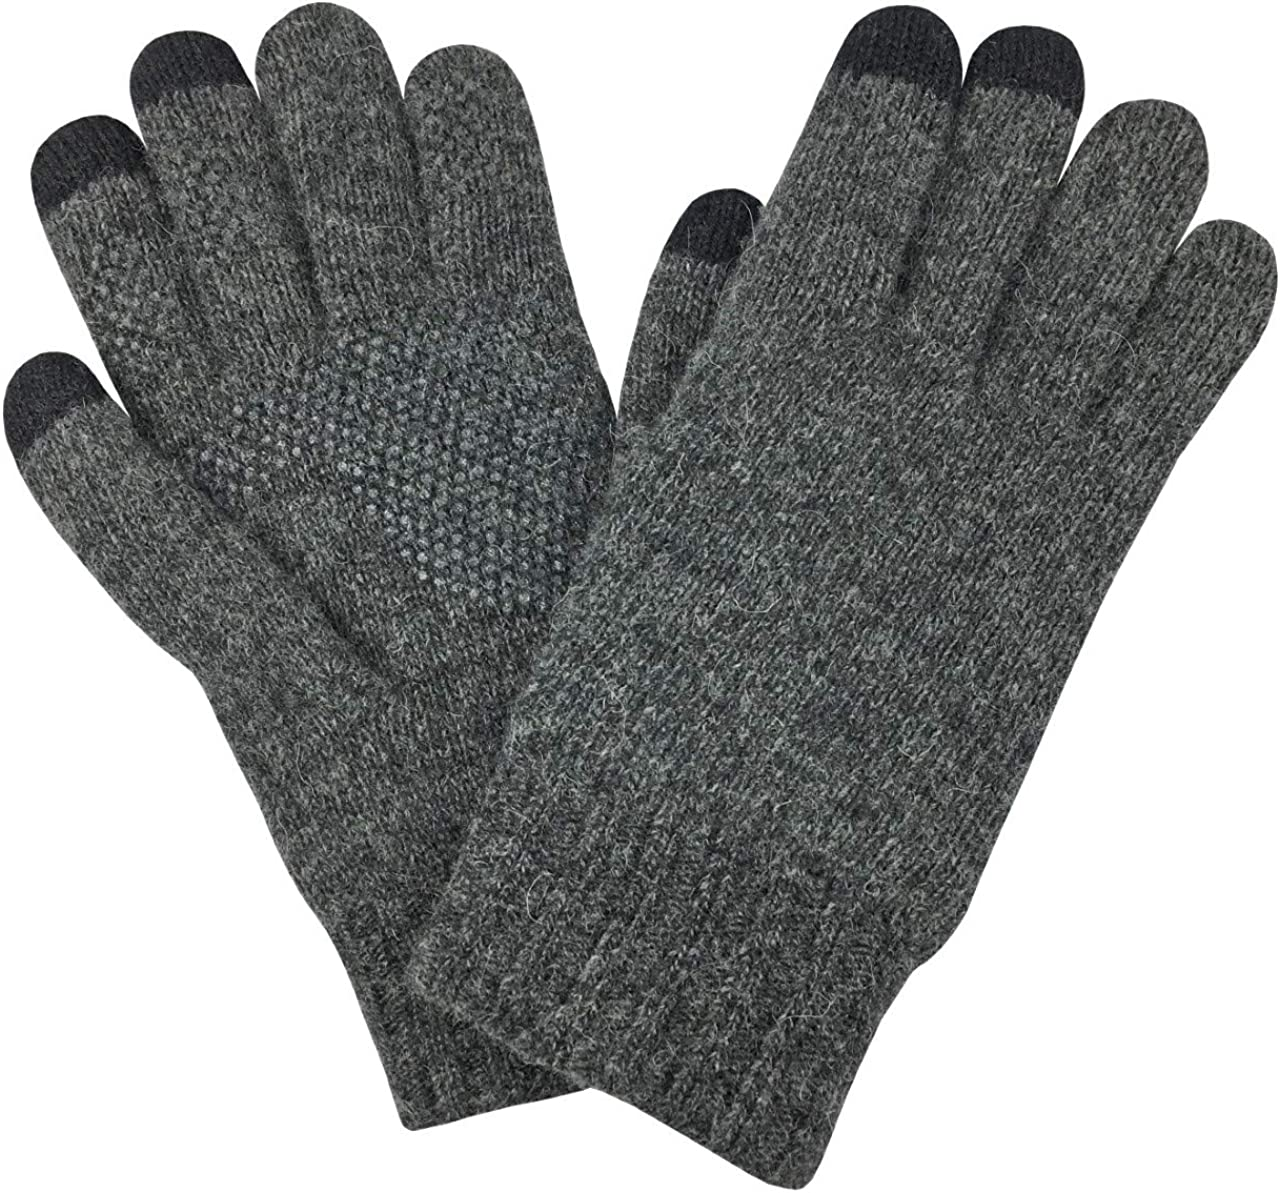 N'Ice Caps Men's & Women's Merino Wool Touchscreen Winter Gloves